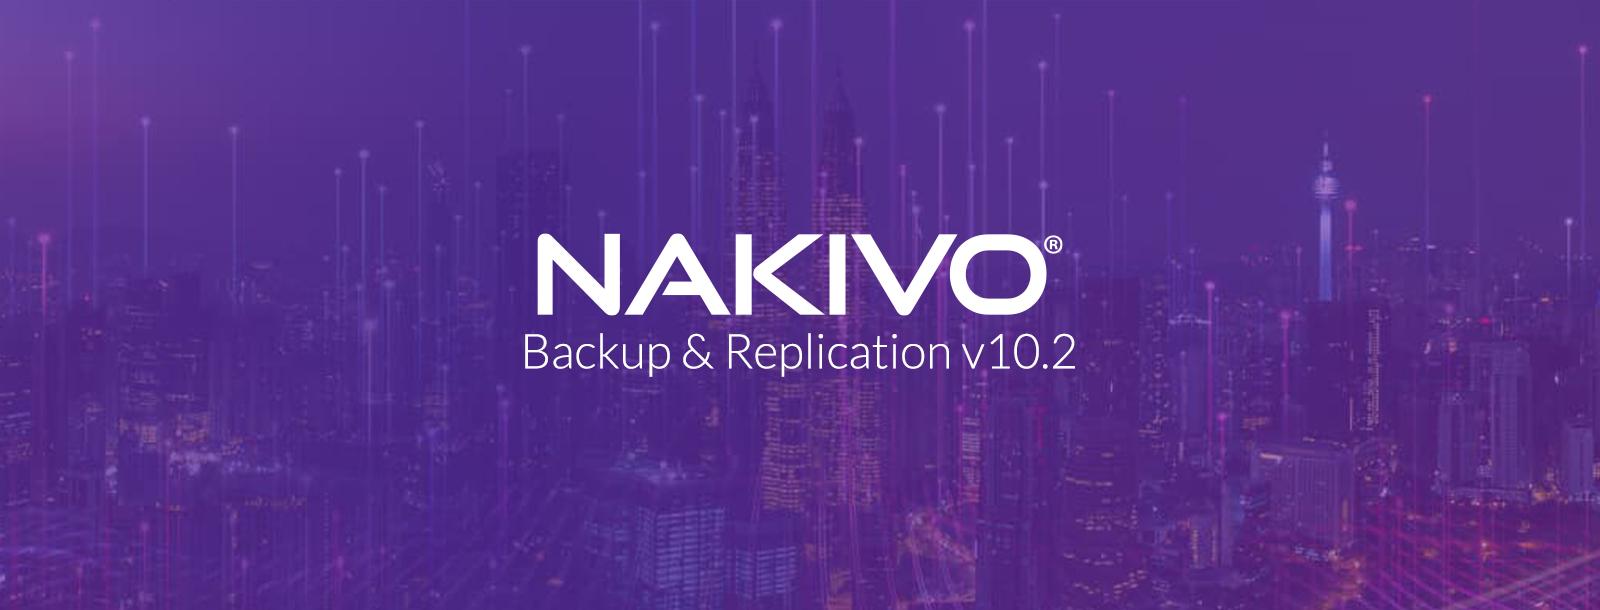 Tryb Multi Tenant w Nakivo Backup&Replication 10.2